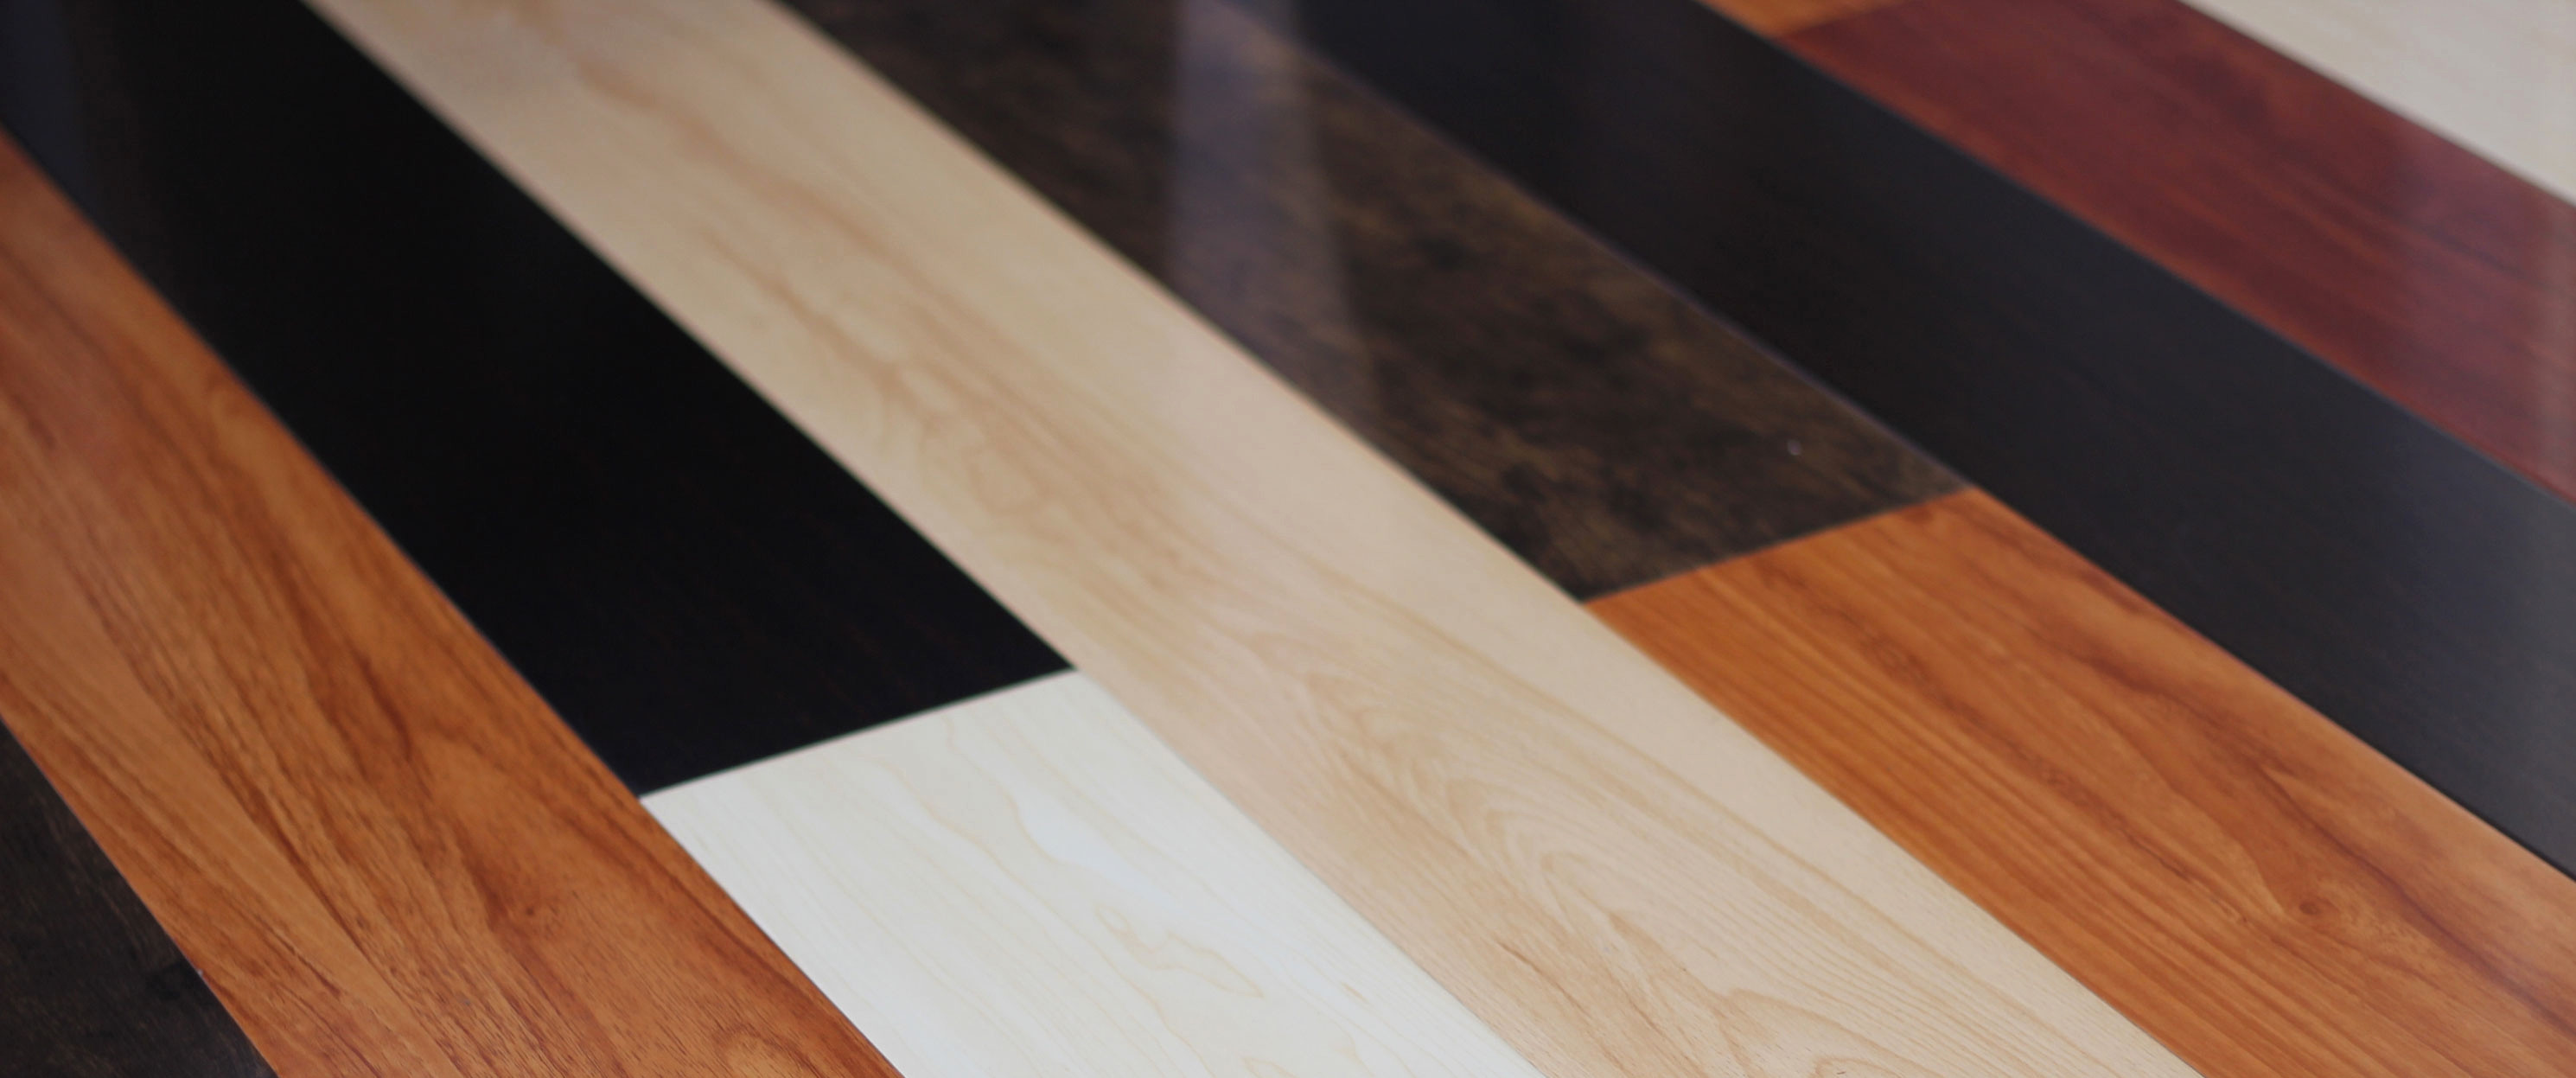 hardwood flooring prices of the flooring place 50 beautiful herringbone vinyl flooring graphics within the flooring place where to buy hardwood flooring inspirational 0d grace place barnegat